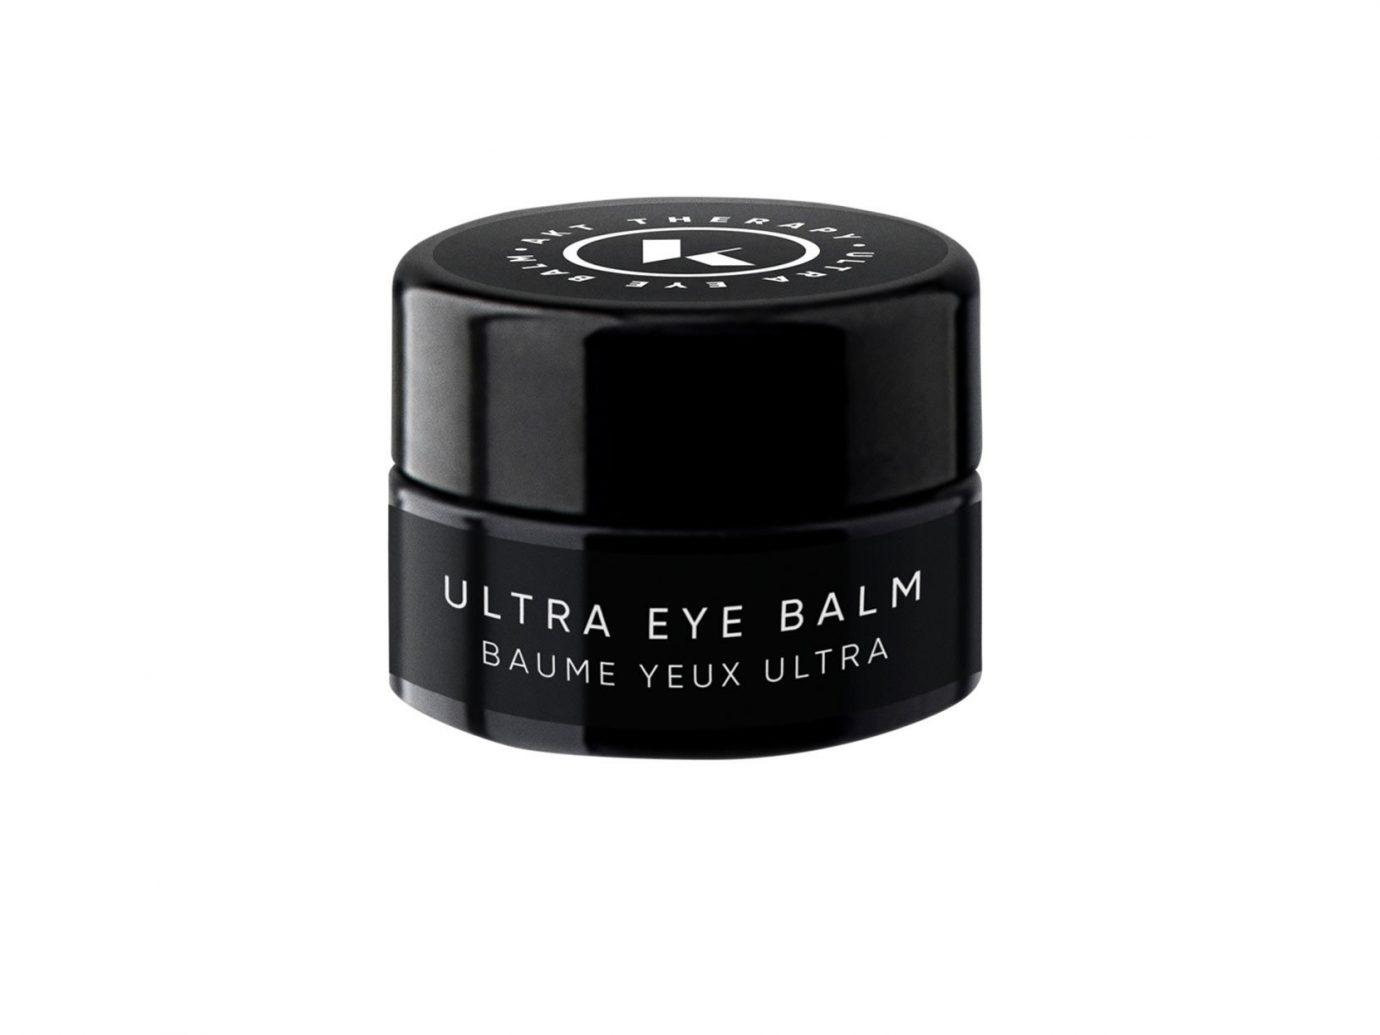 Influencers + Tastemakers Travel Shop Trip Ideas product cream product design cosmetics hardware camera lens